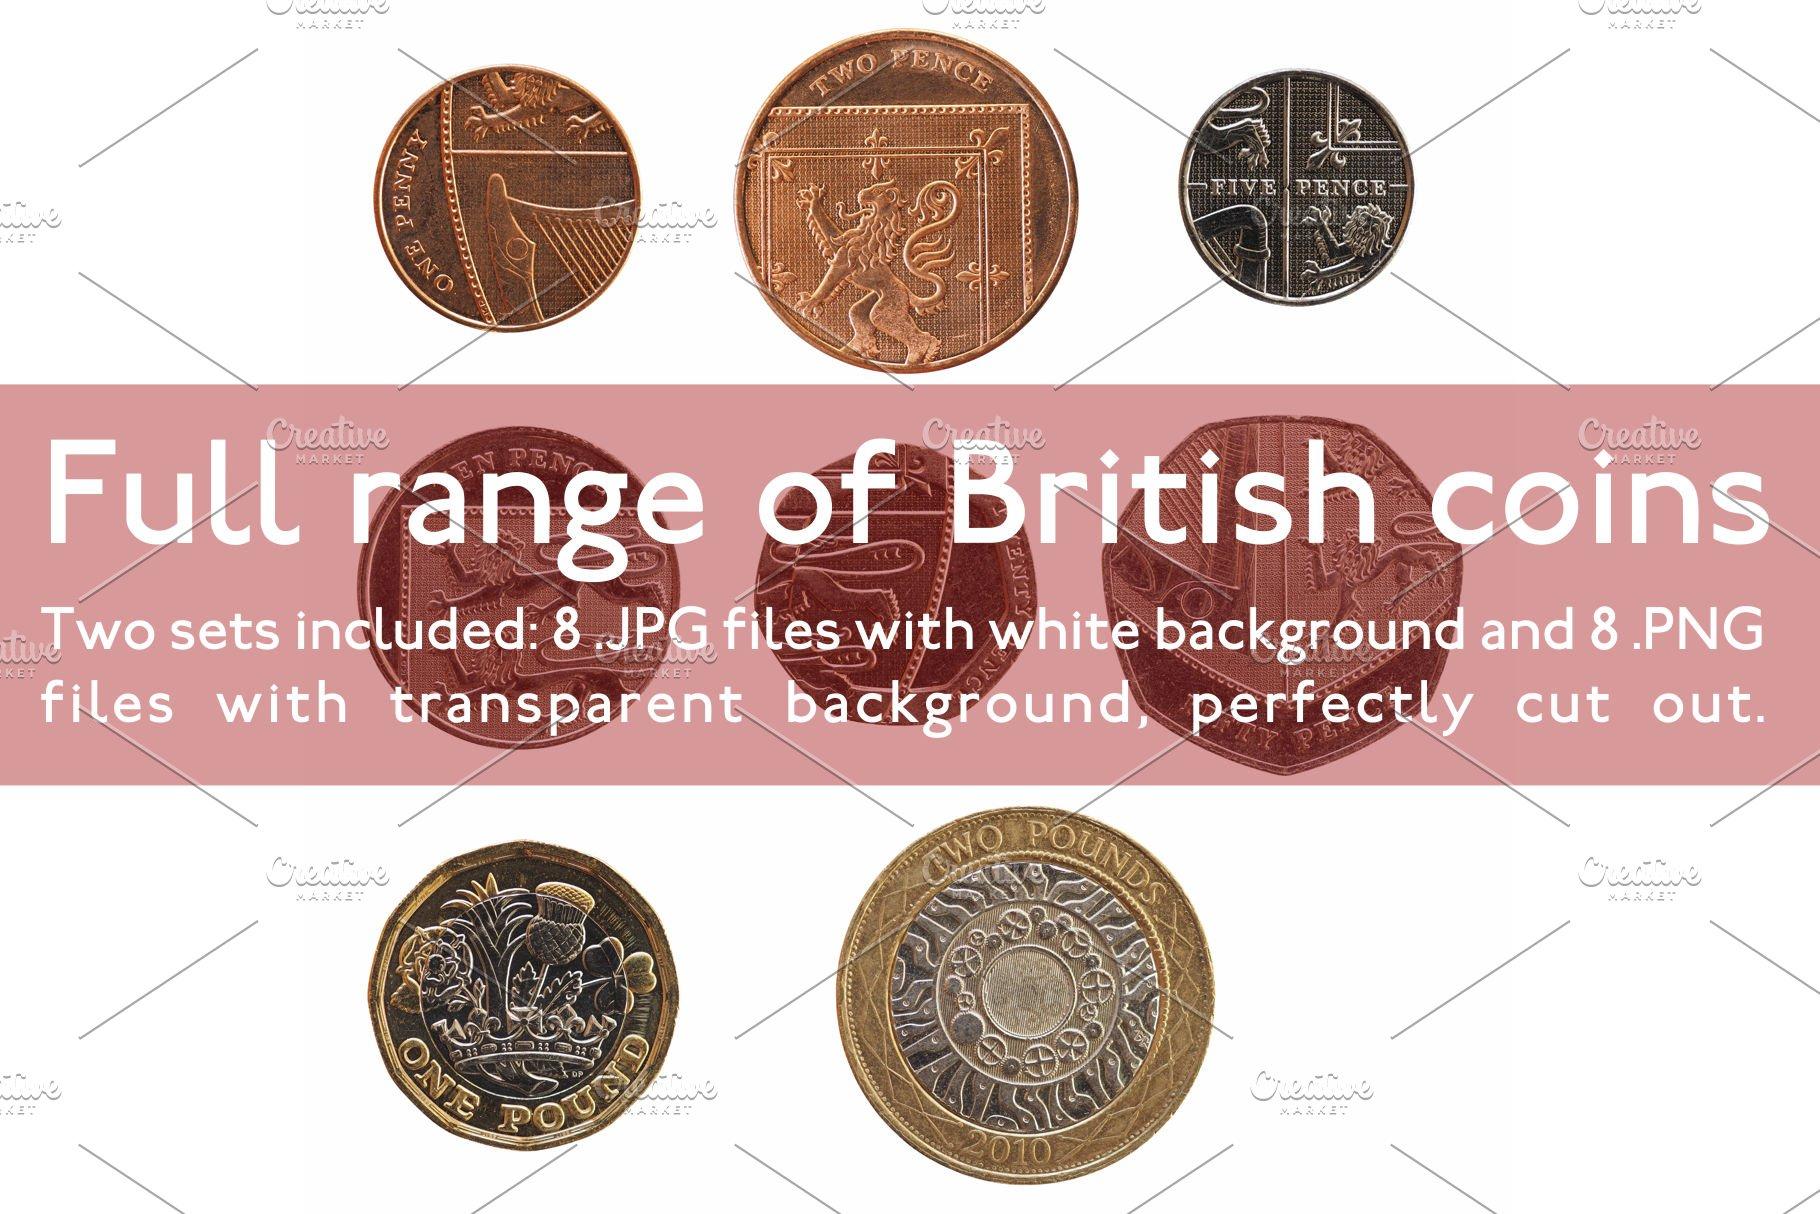 Full range of British coins